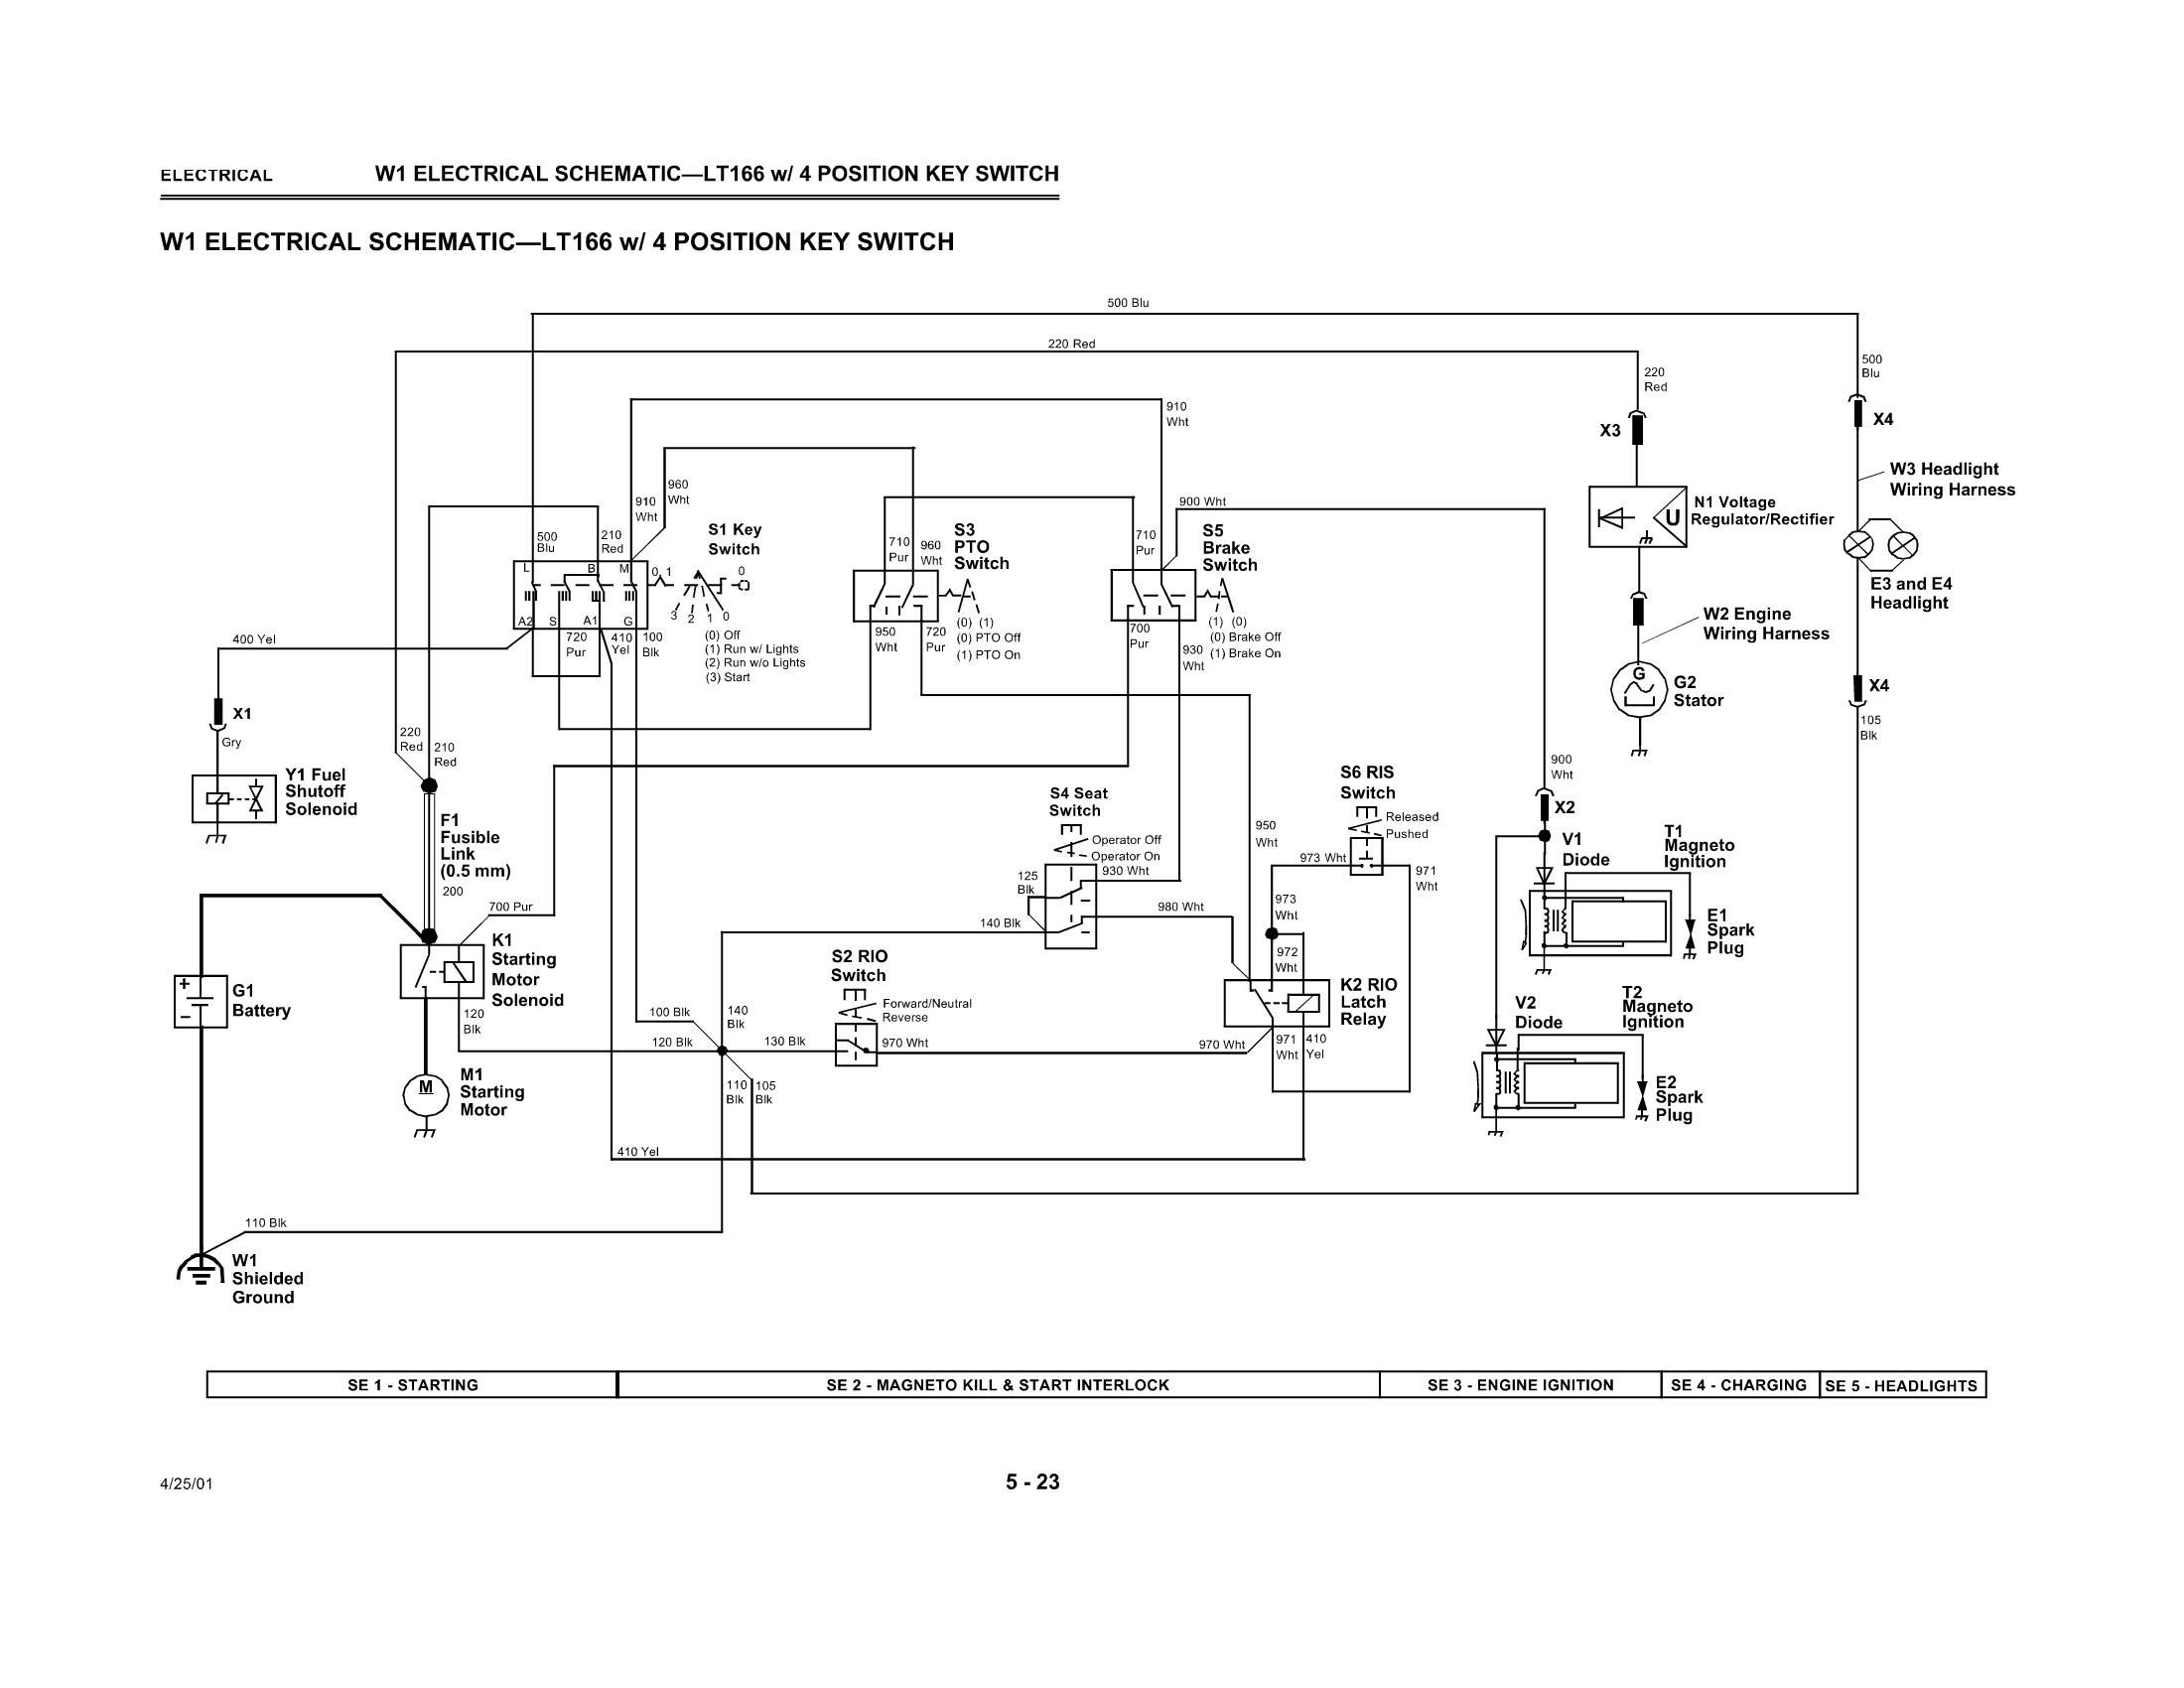 John Deere Lt150 Wiring Diagram Lt155 Into Lt166 Wiring issues Of John Deere Lt150 Wiring Diagram